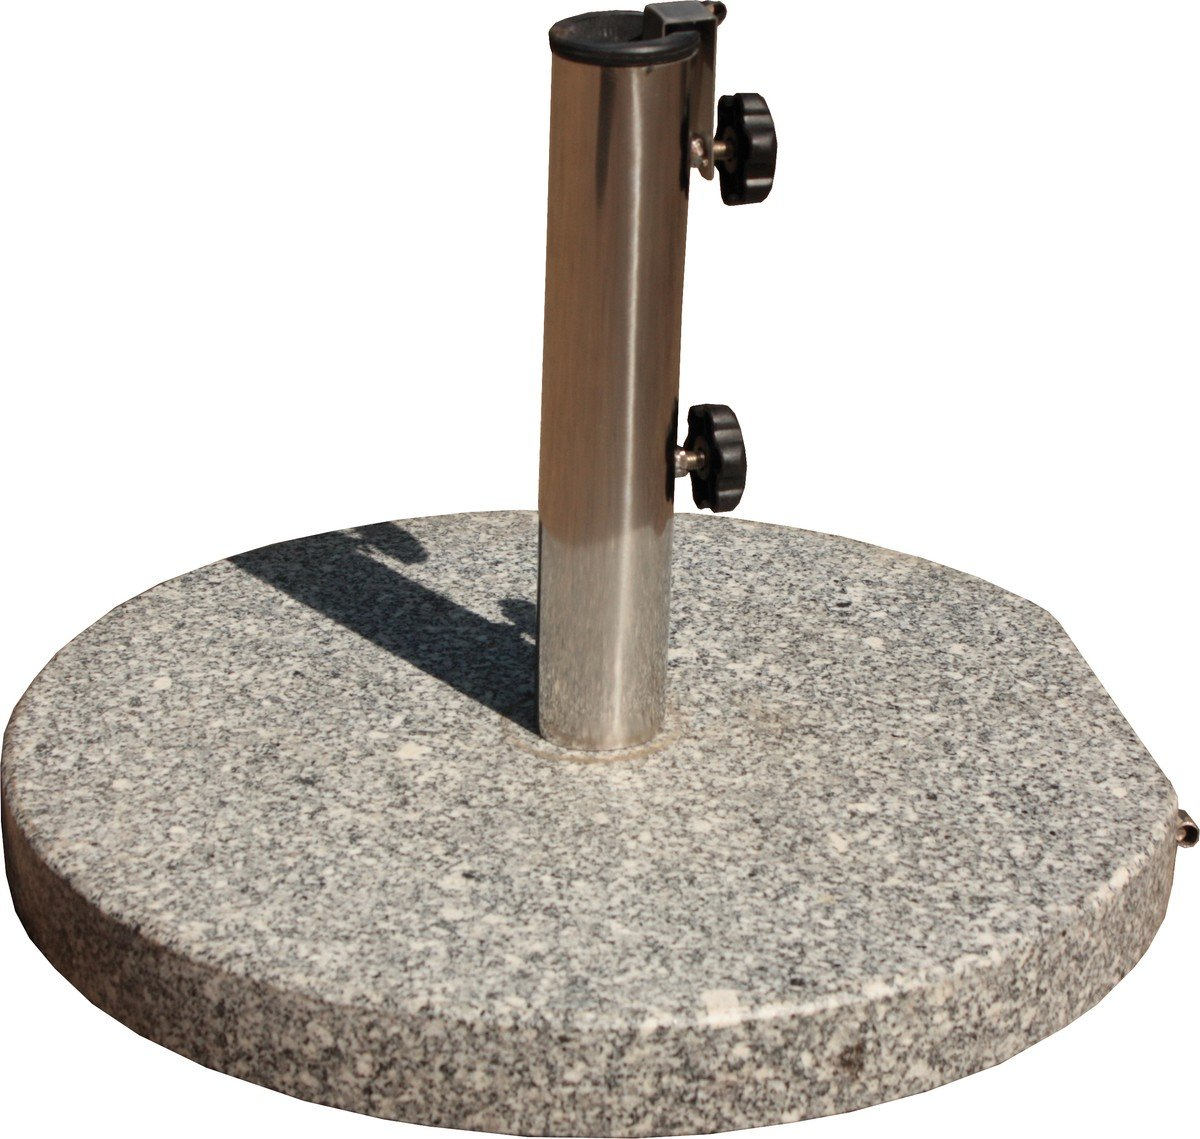 Fun Star Schirmst. Granit 45 Kg 50X50 cm 561